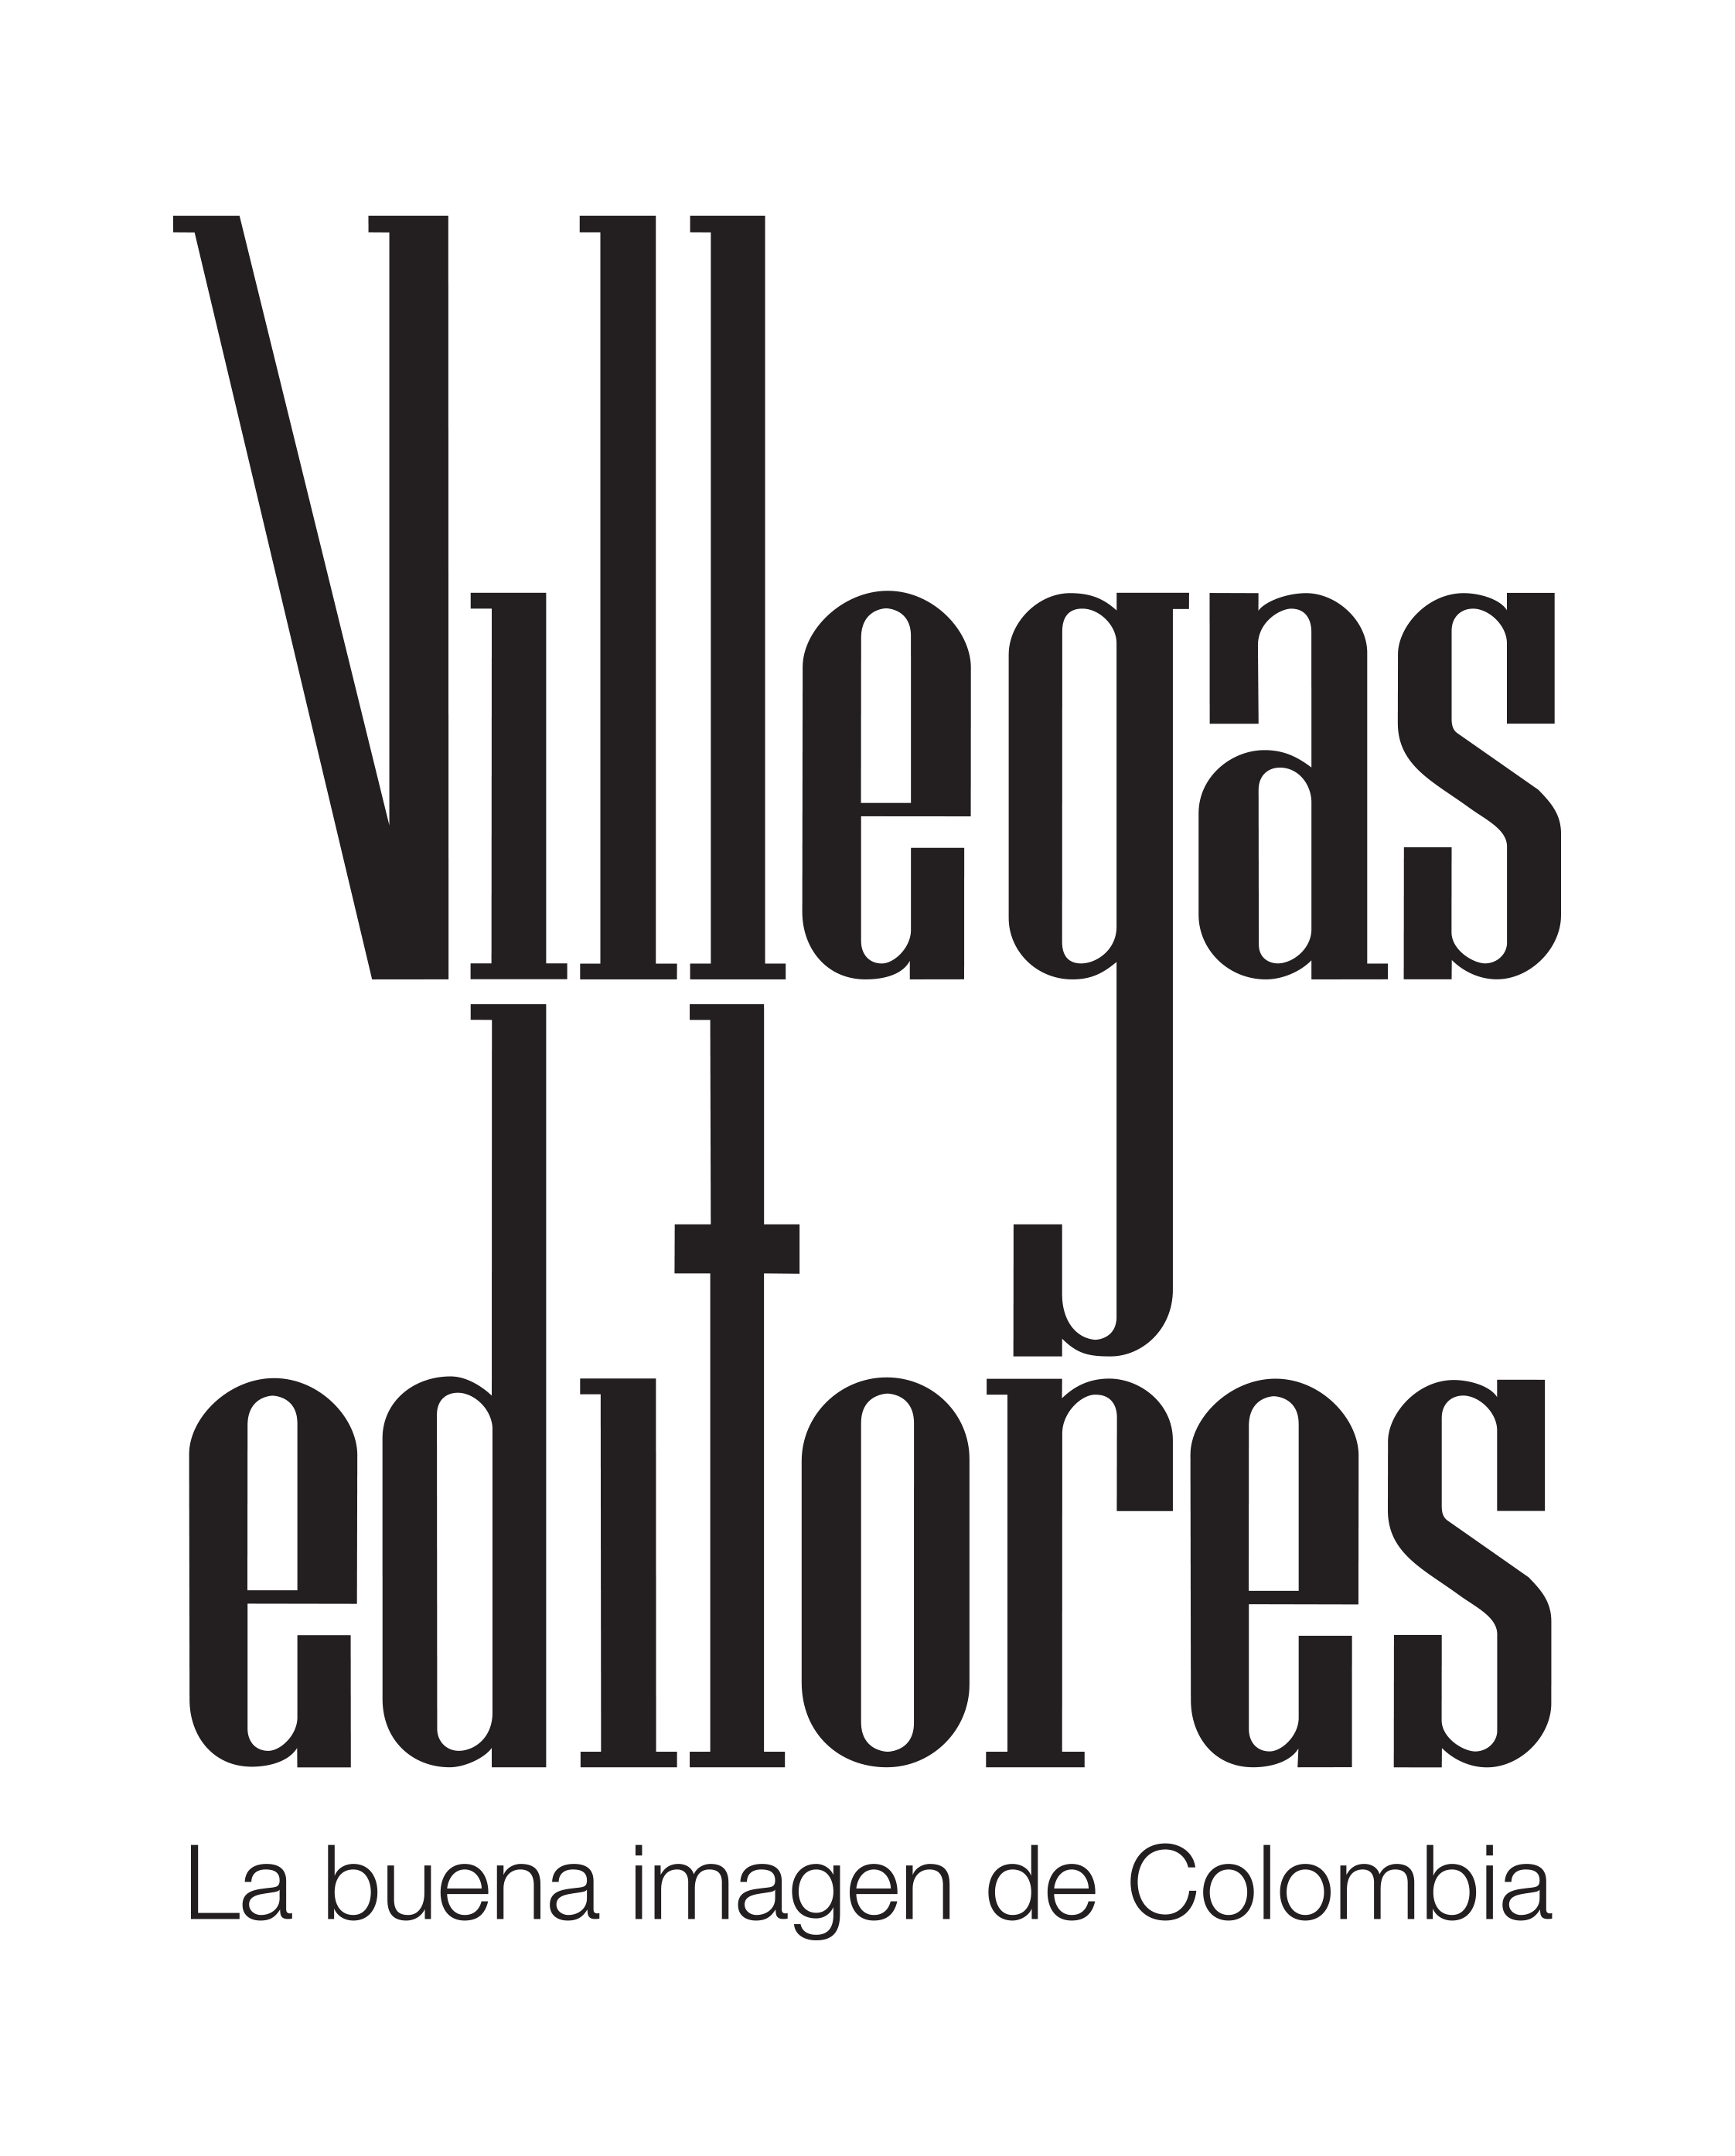 villegas-editores